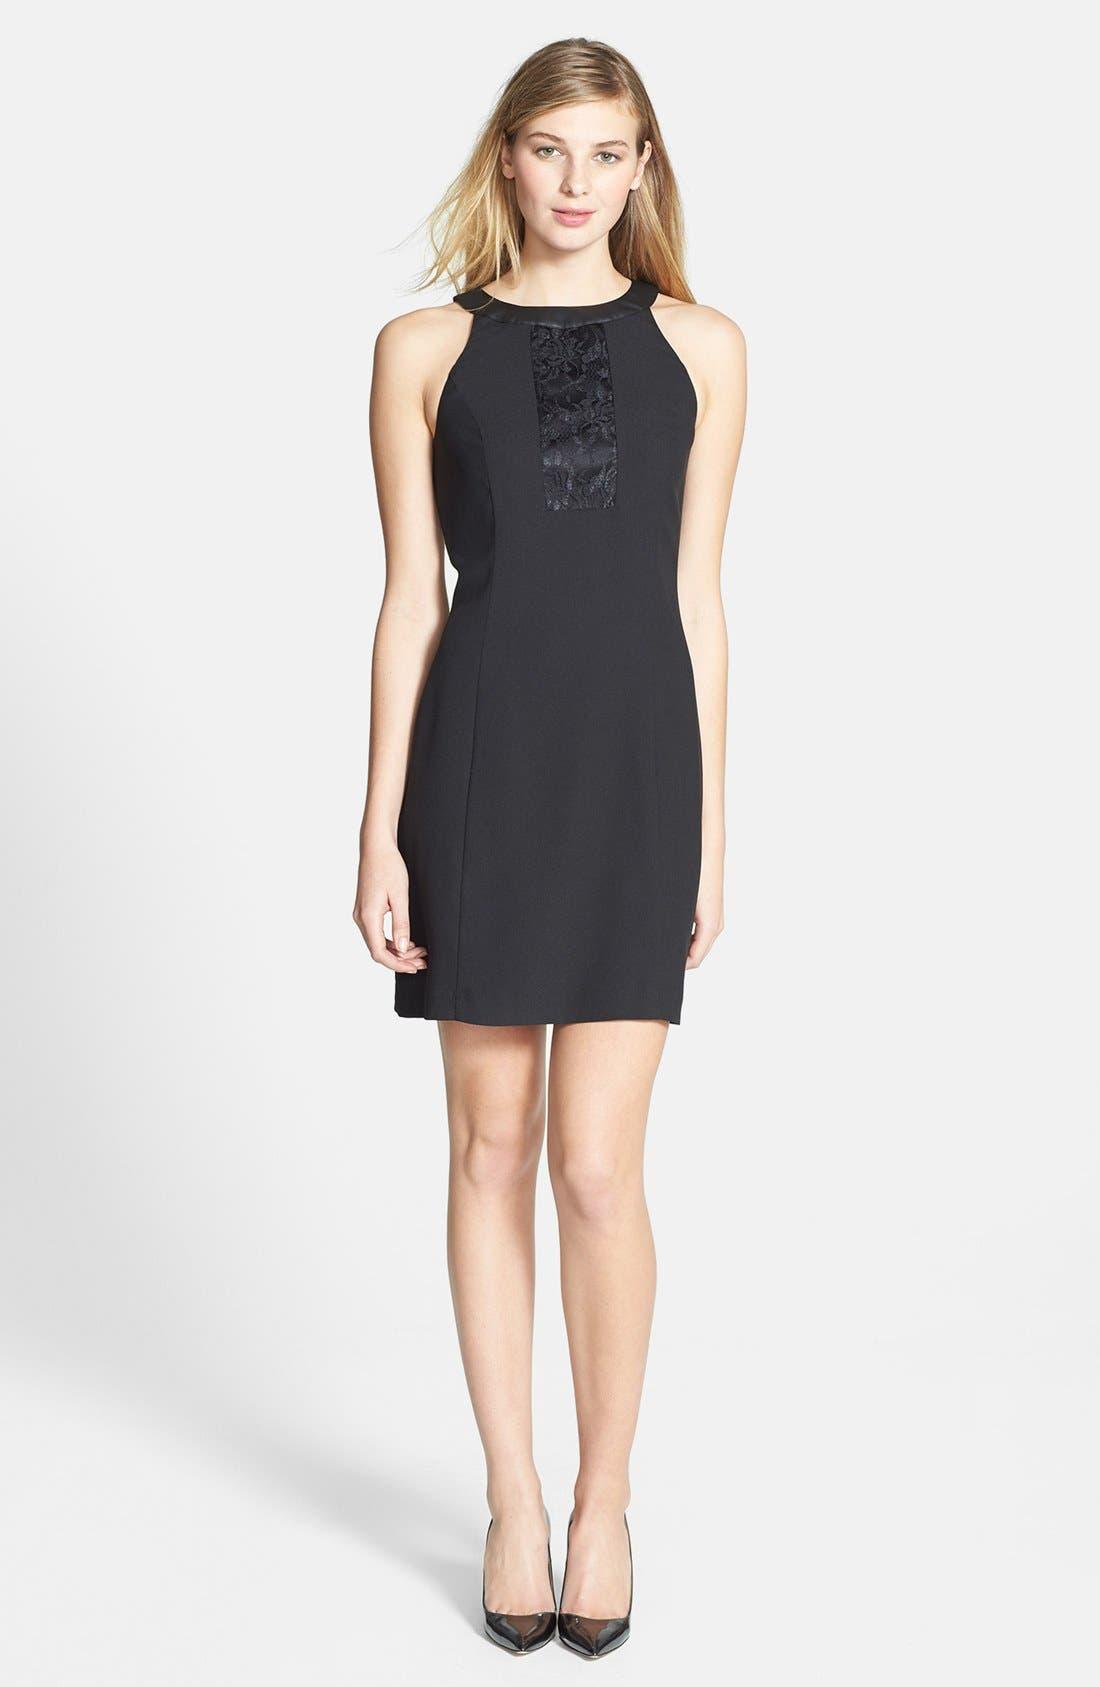 Main Image - kensie Lace Detail Crepe Dress